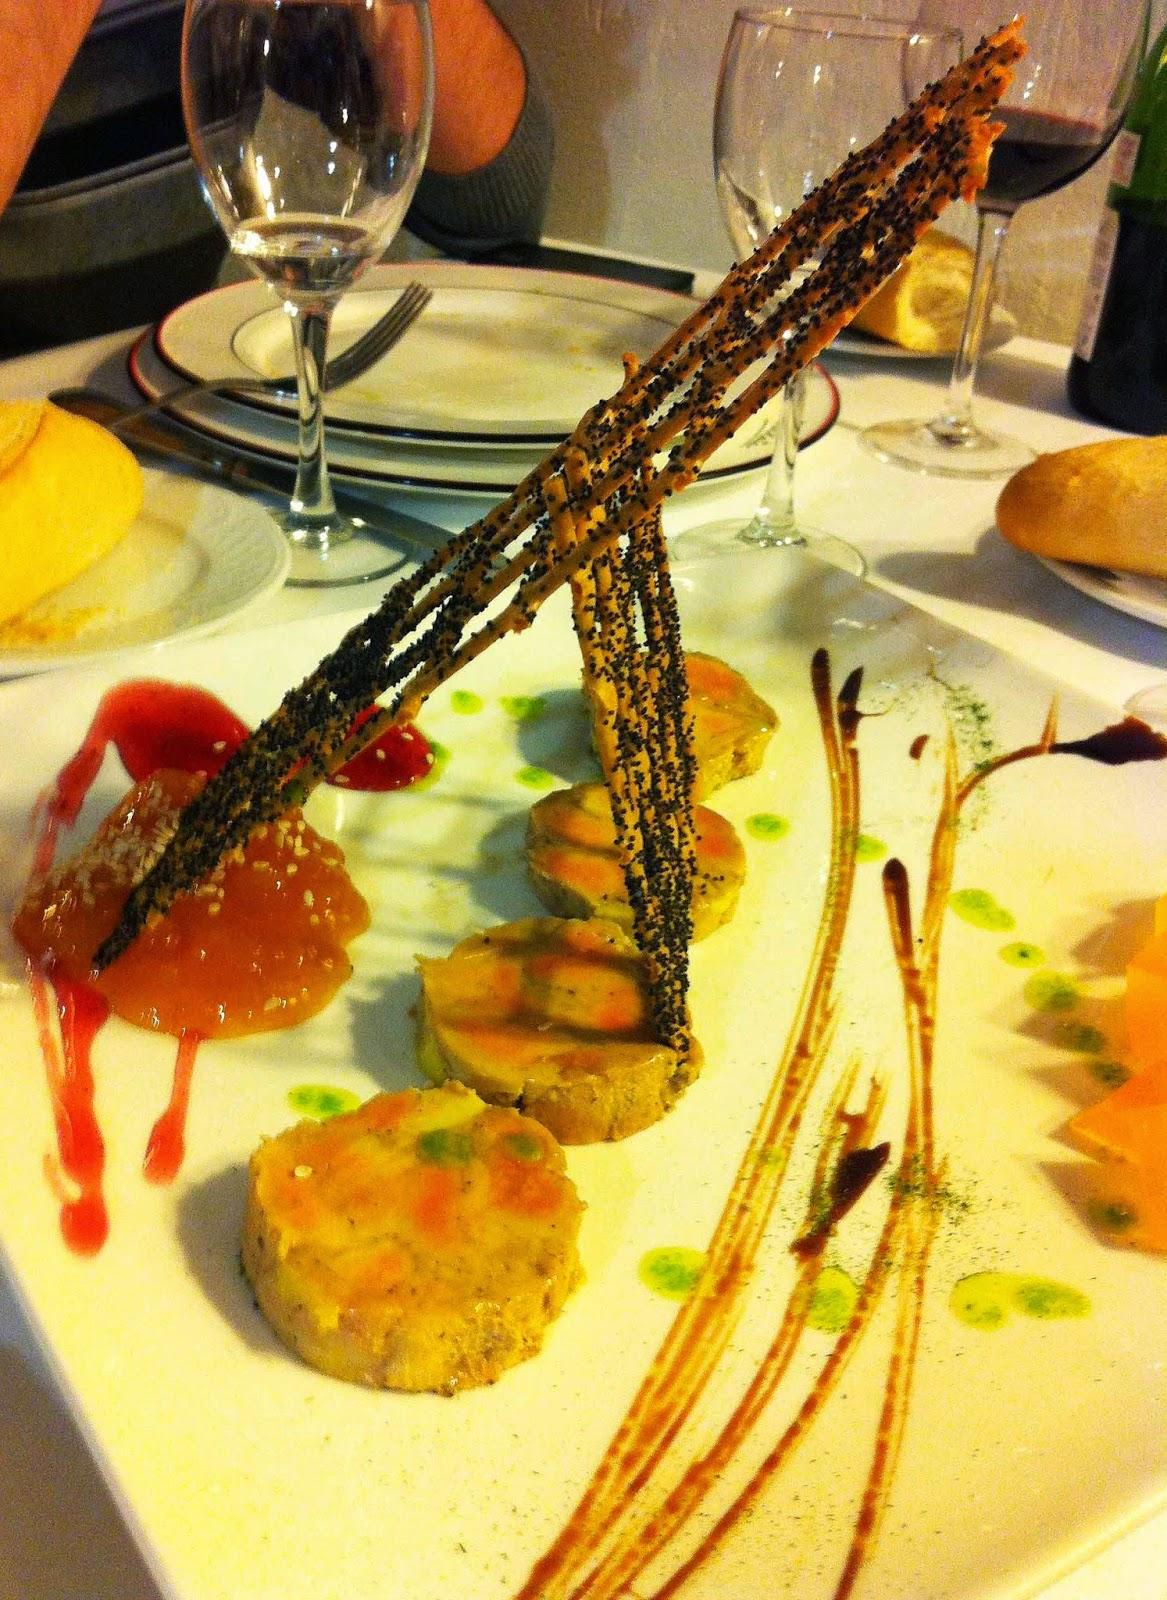 Restaurante-Farketa56-Bilbao-Micuit-Detalle